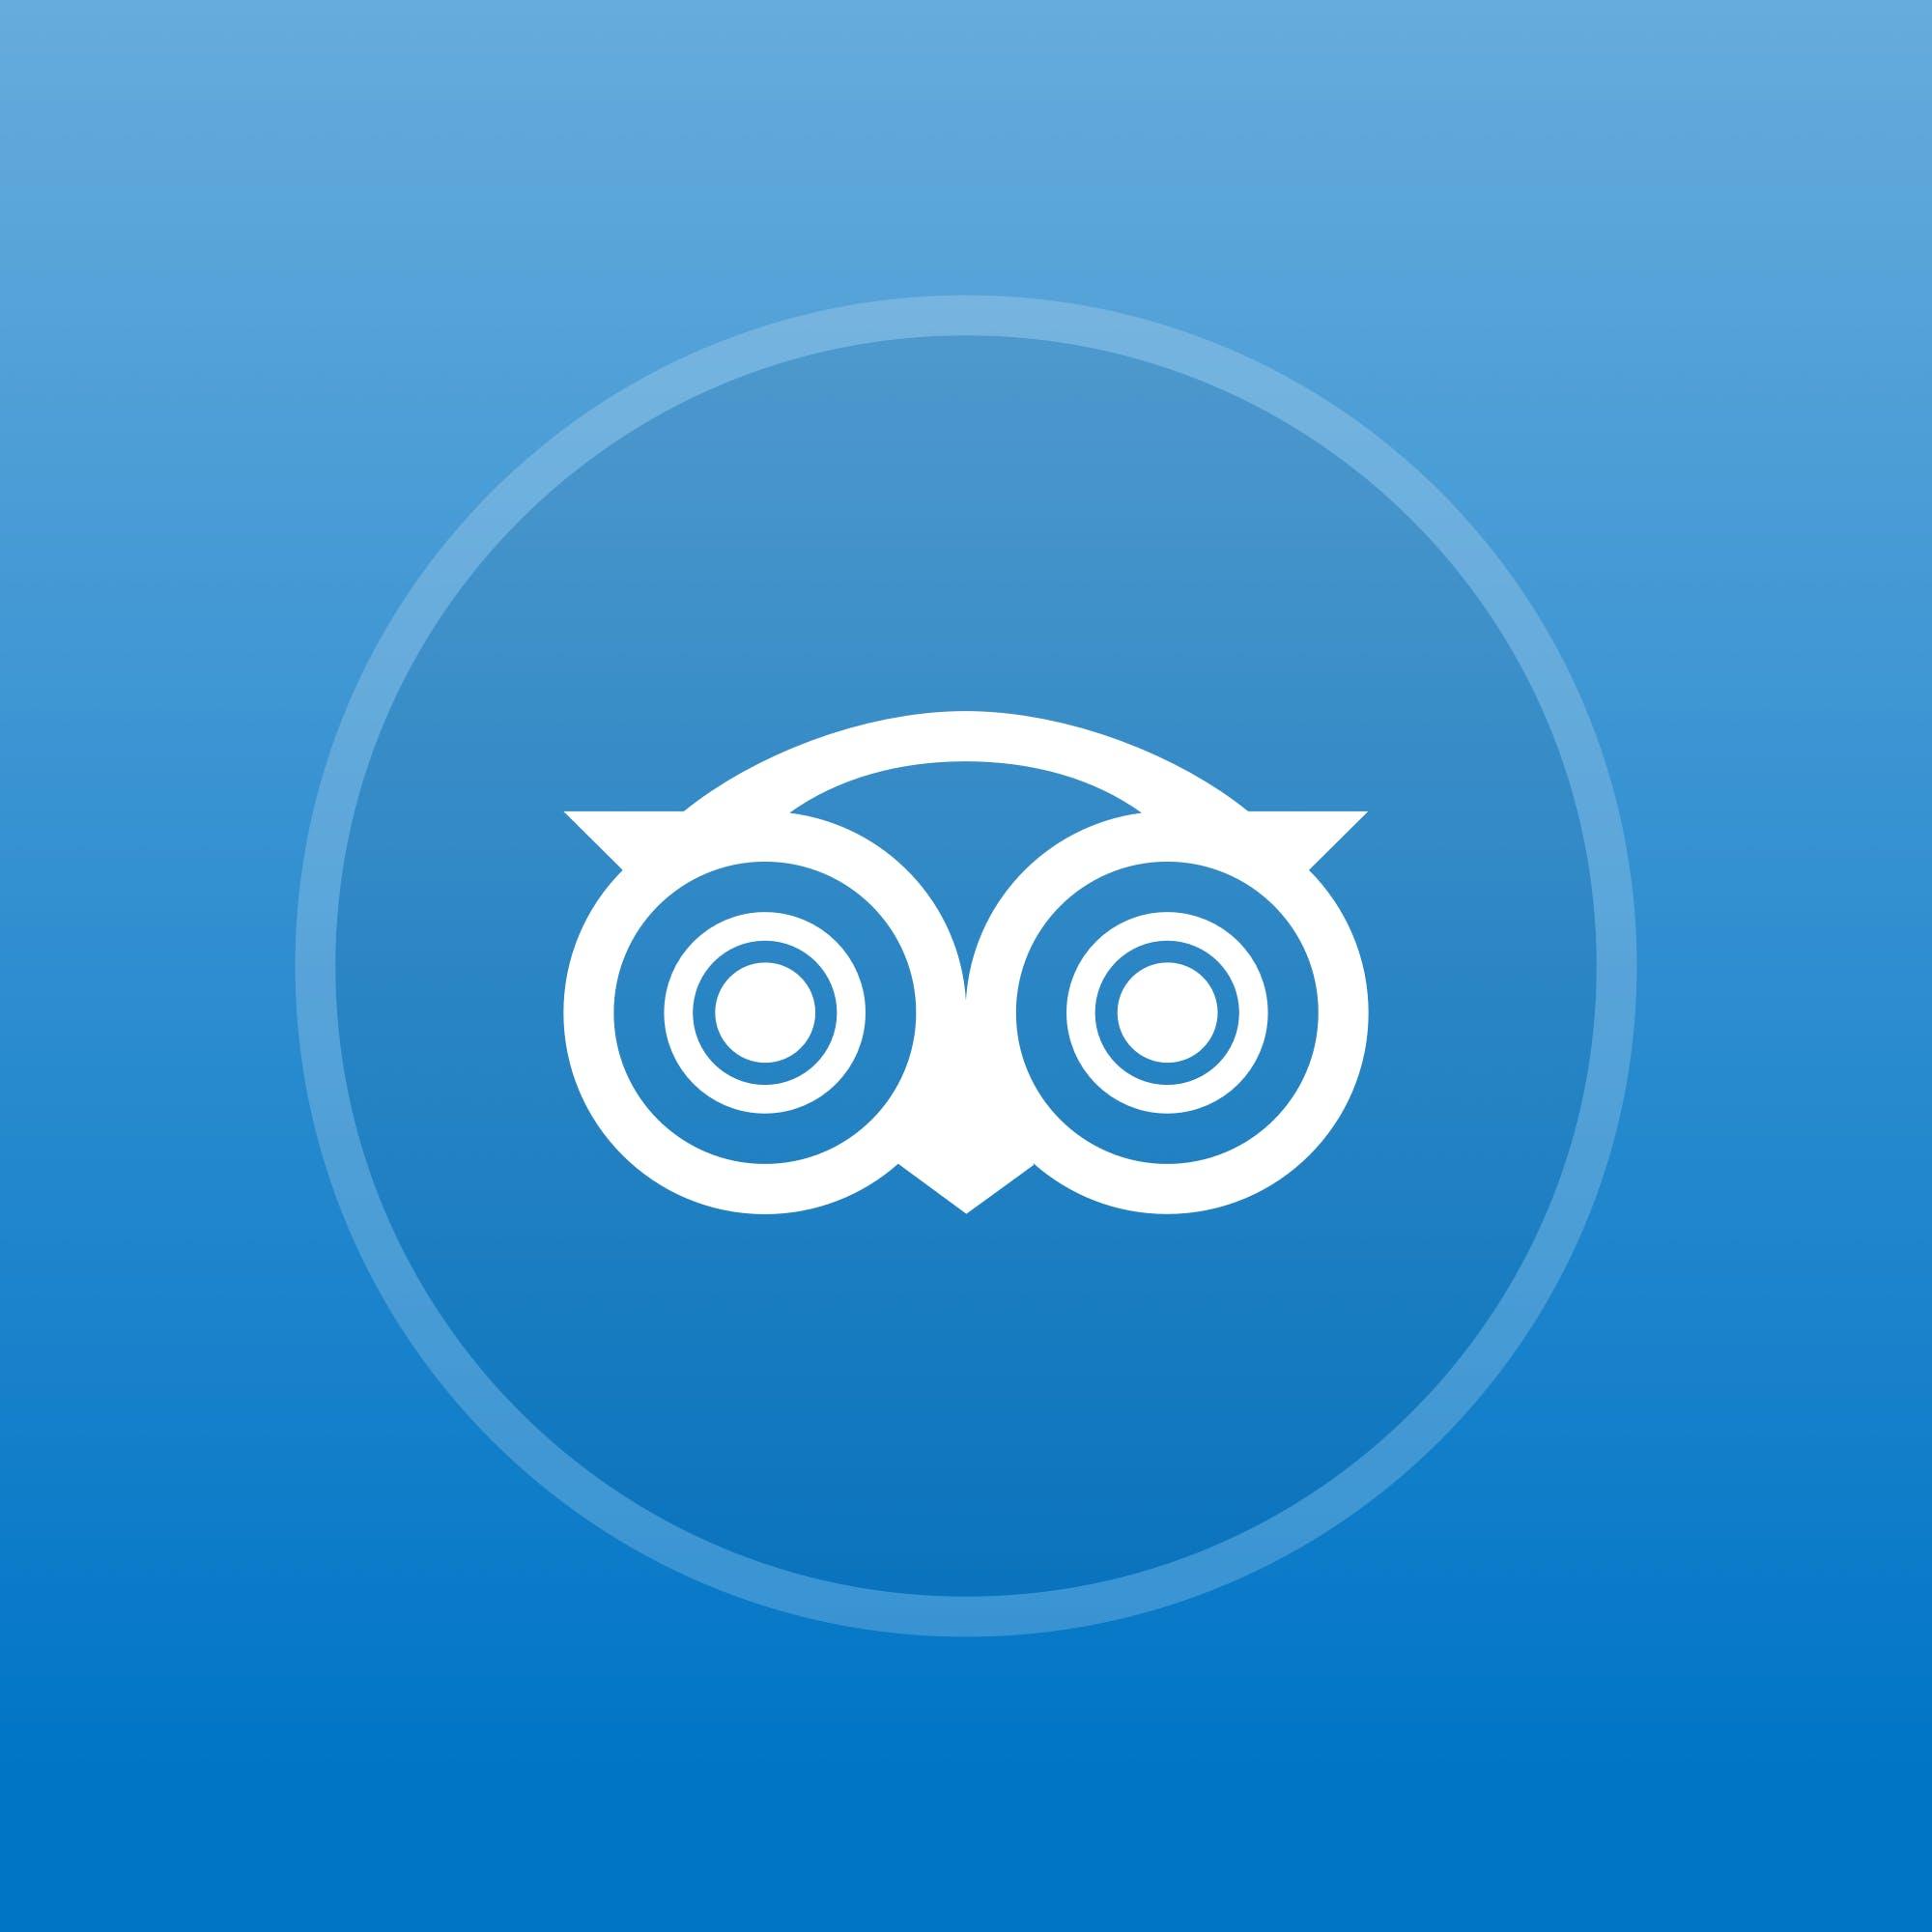 yobet体育官网Medallia酒店提供TripAdvisor评论